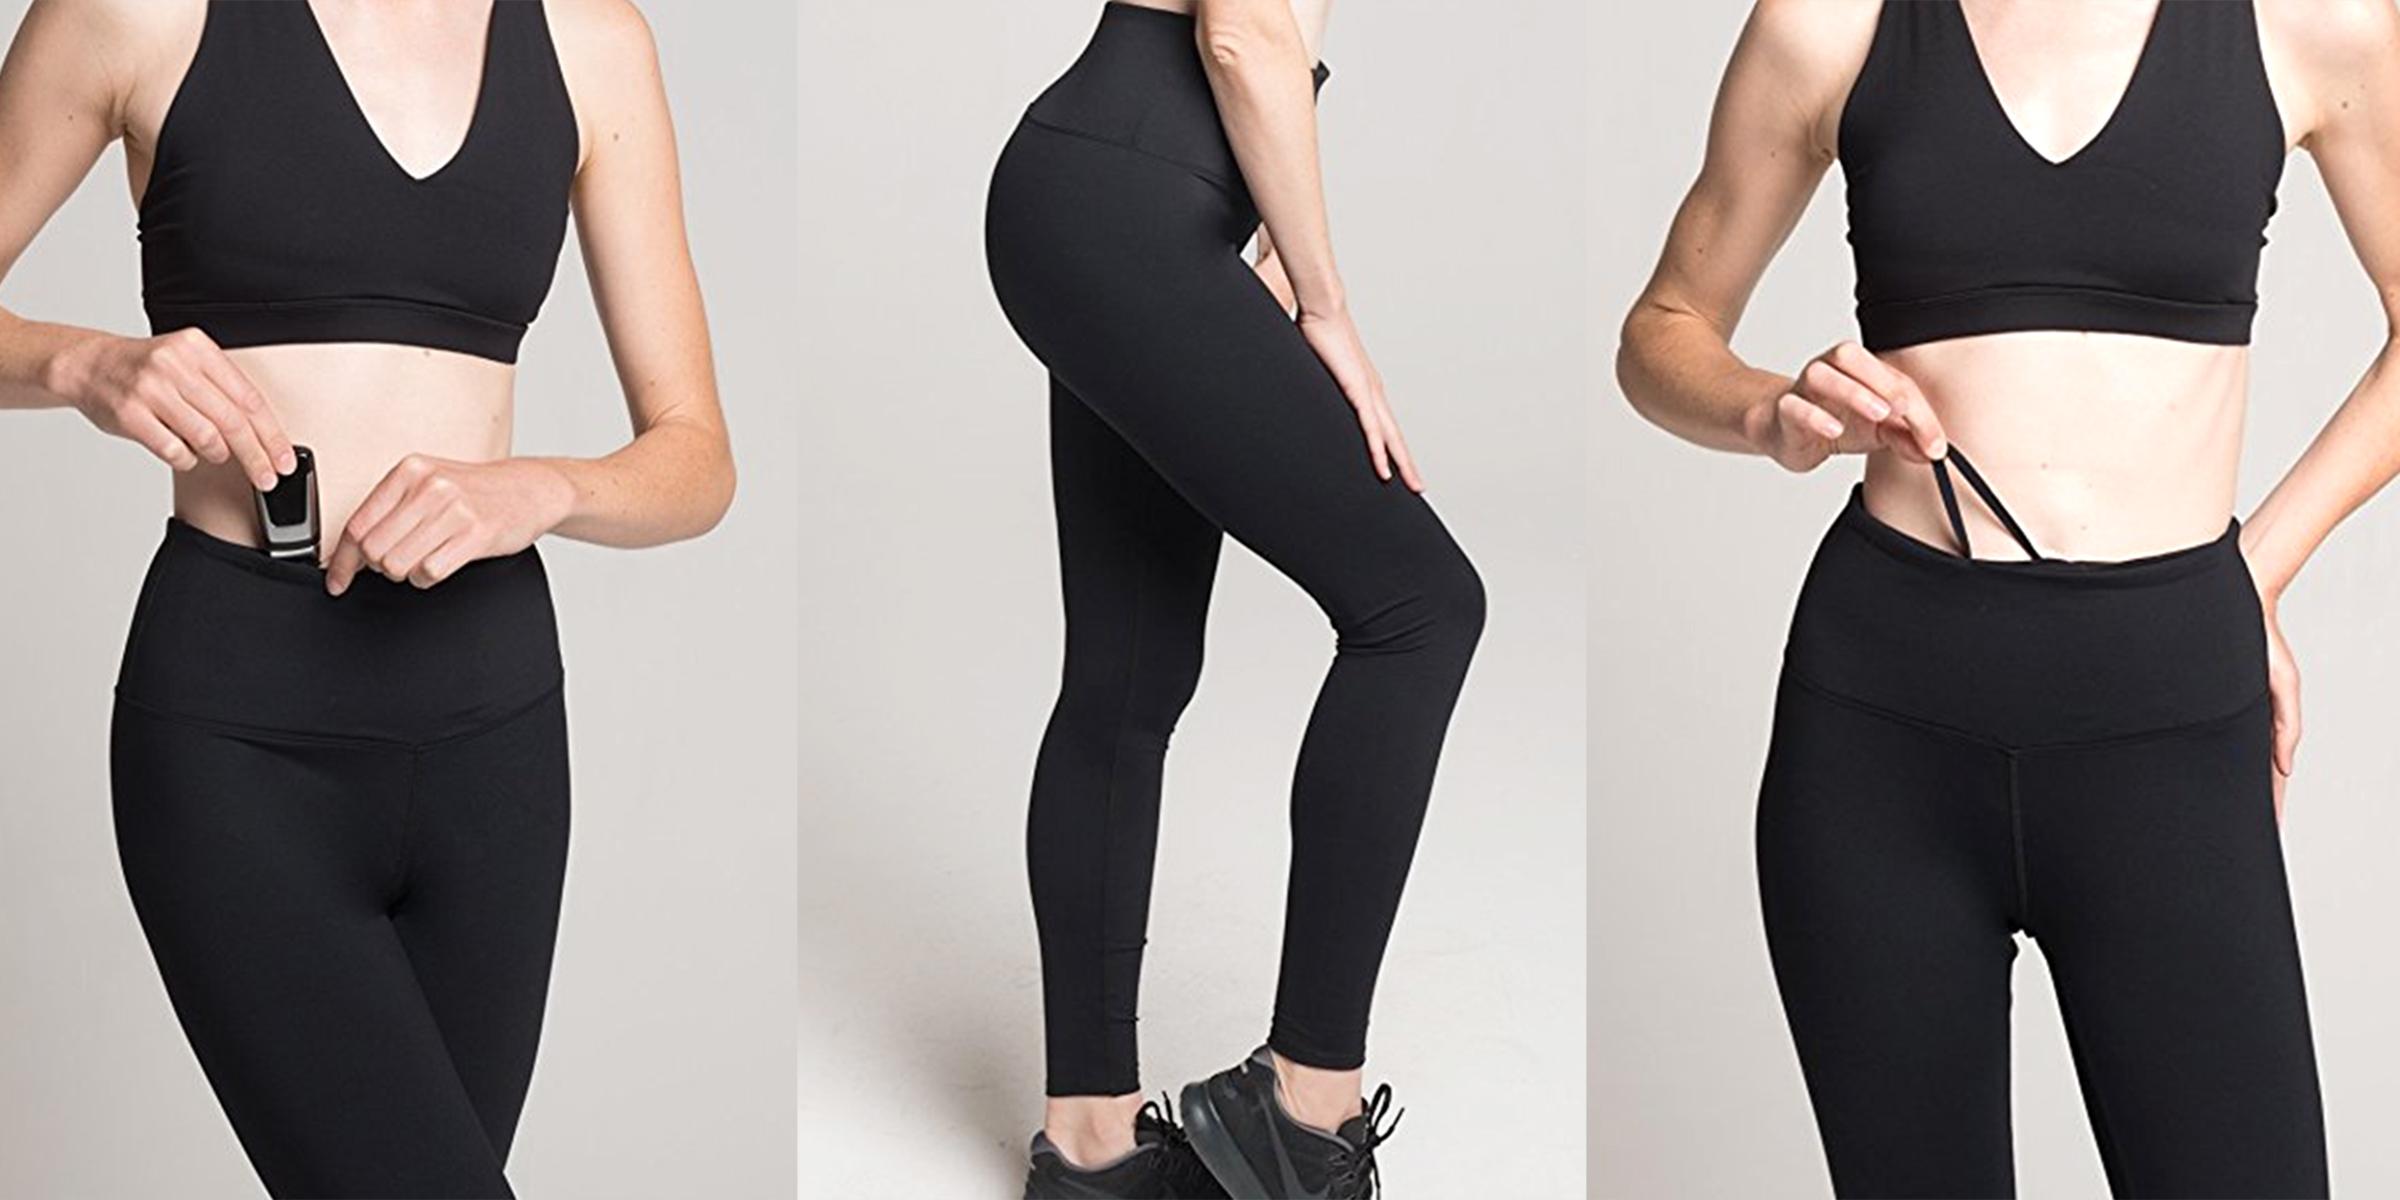 Leggings Without Panties Pics